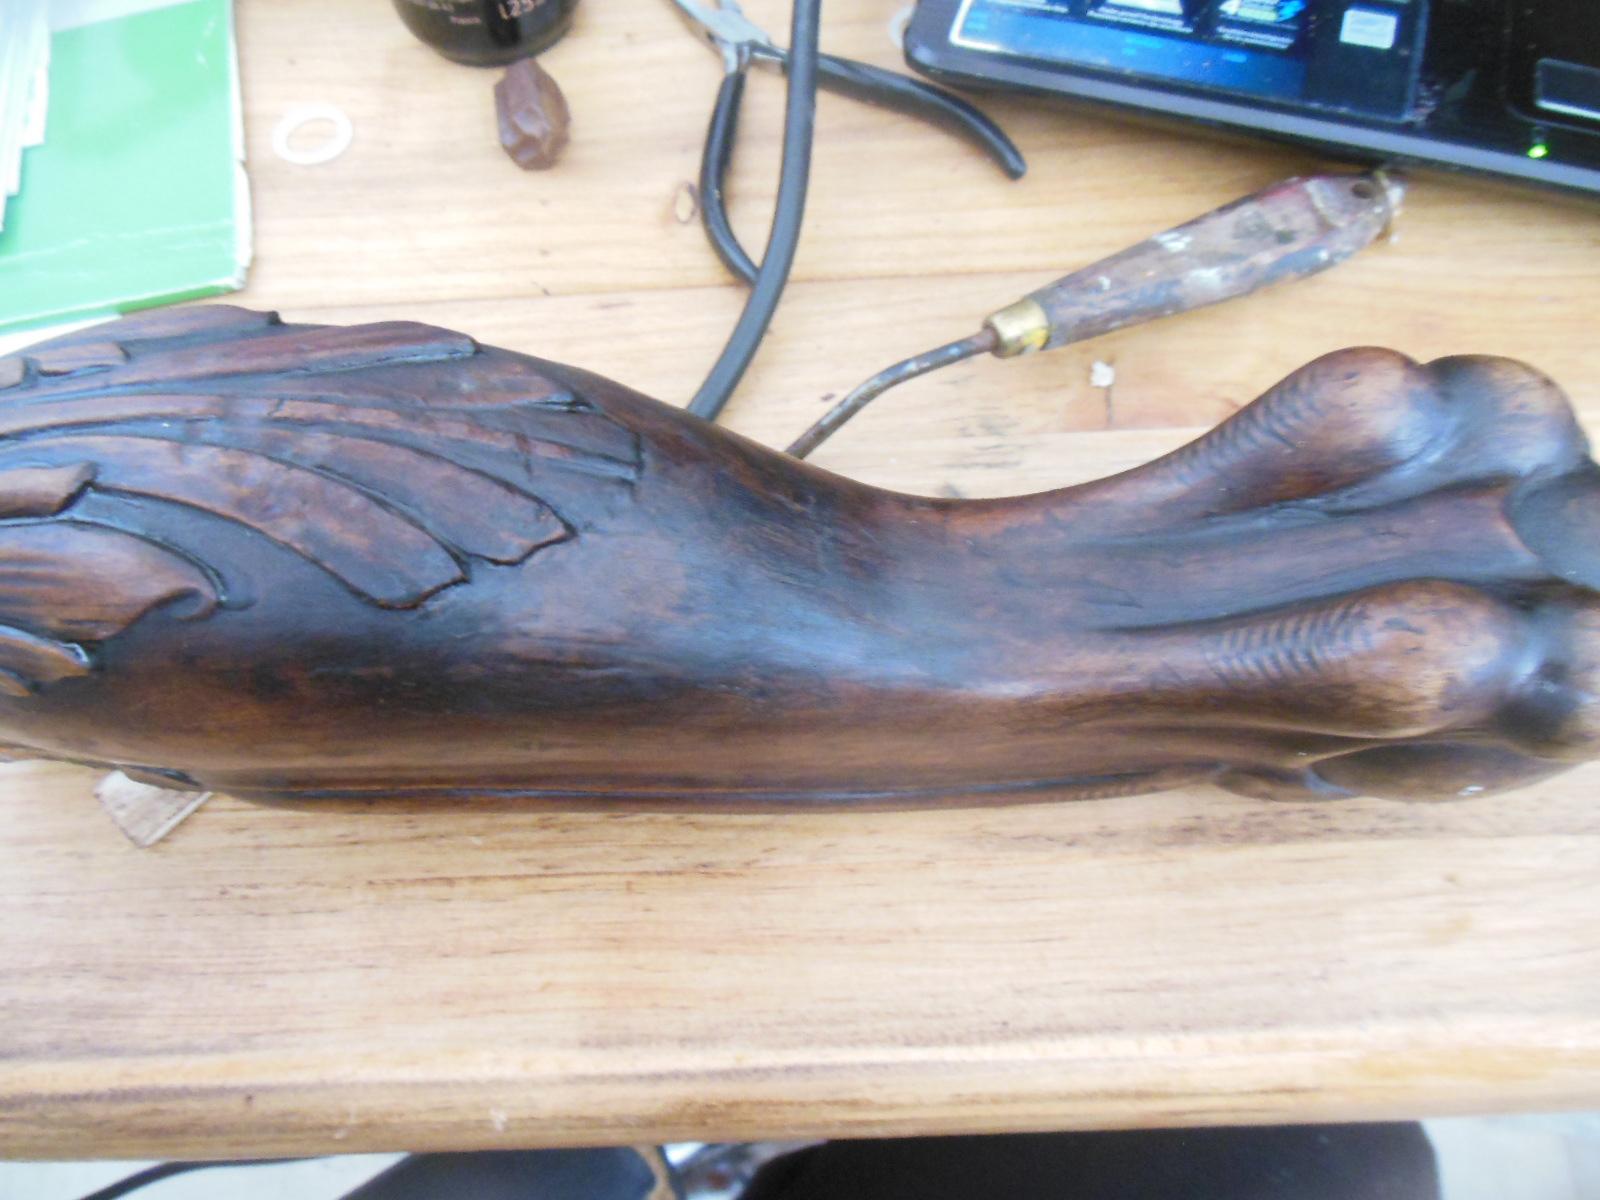 restaurando pata chippendale restaurando antiguedades en la josa shop 3